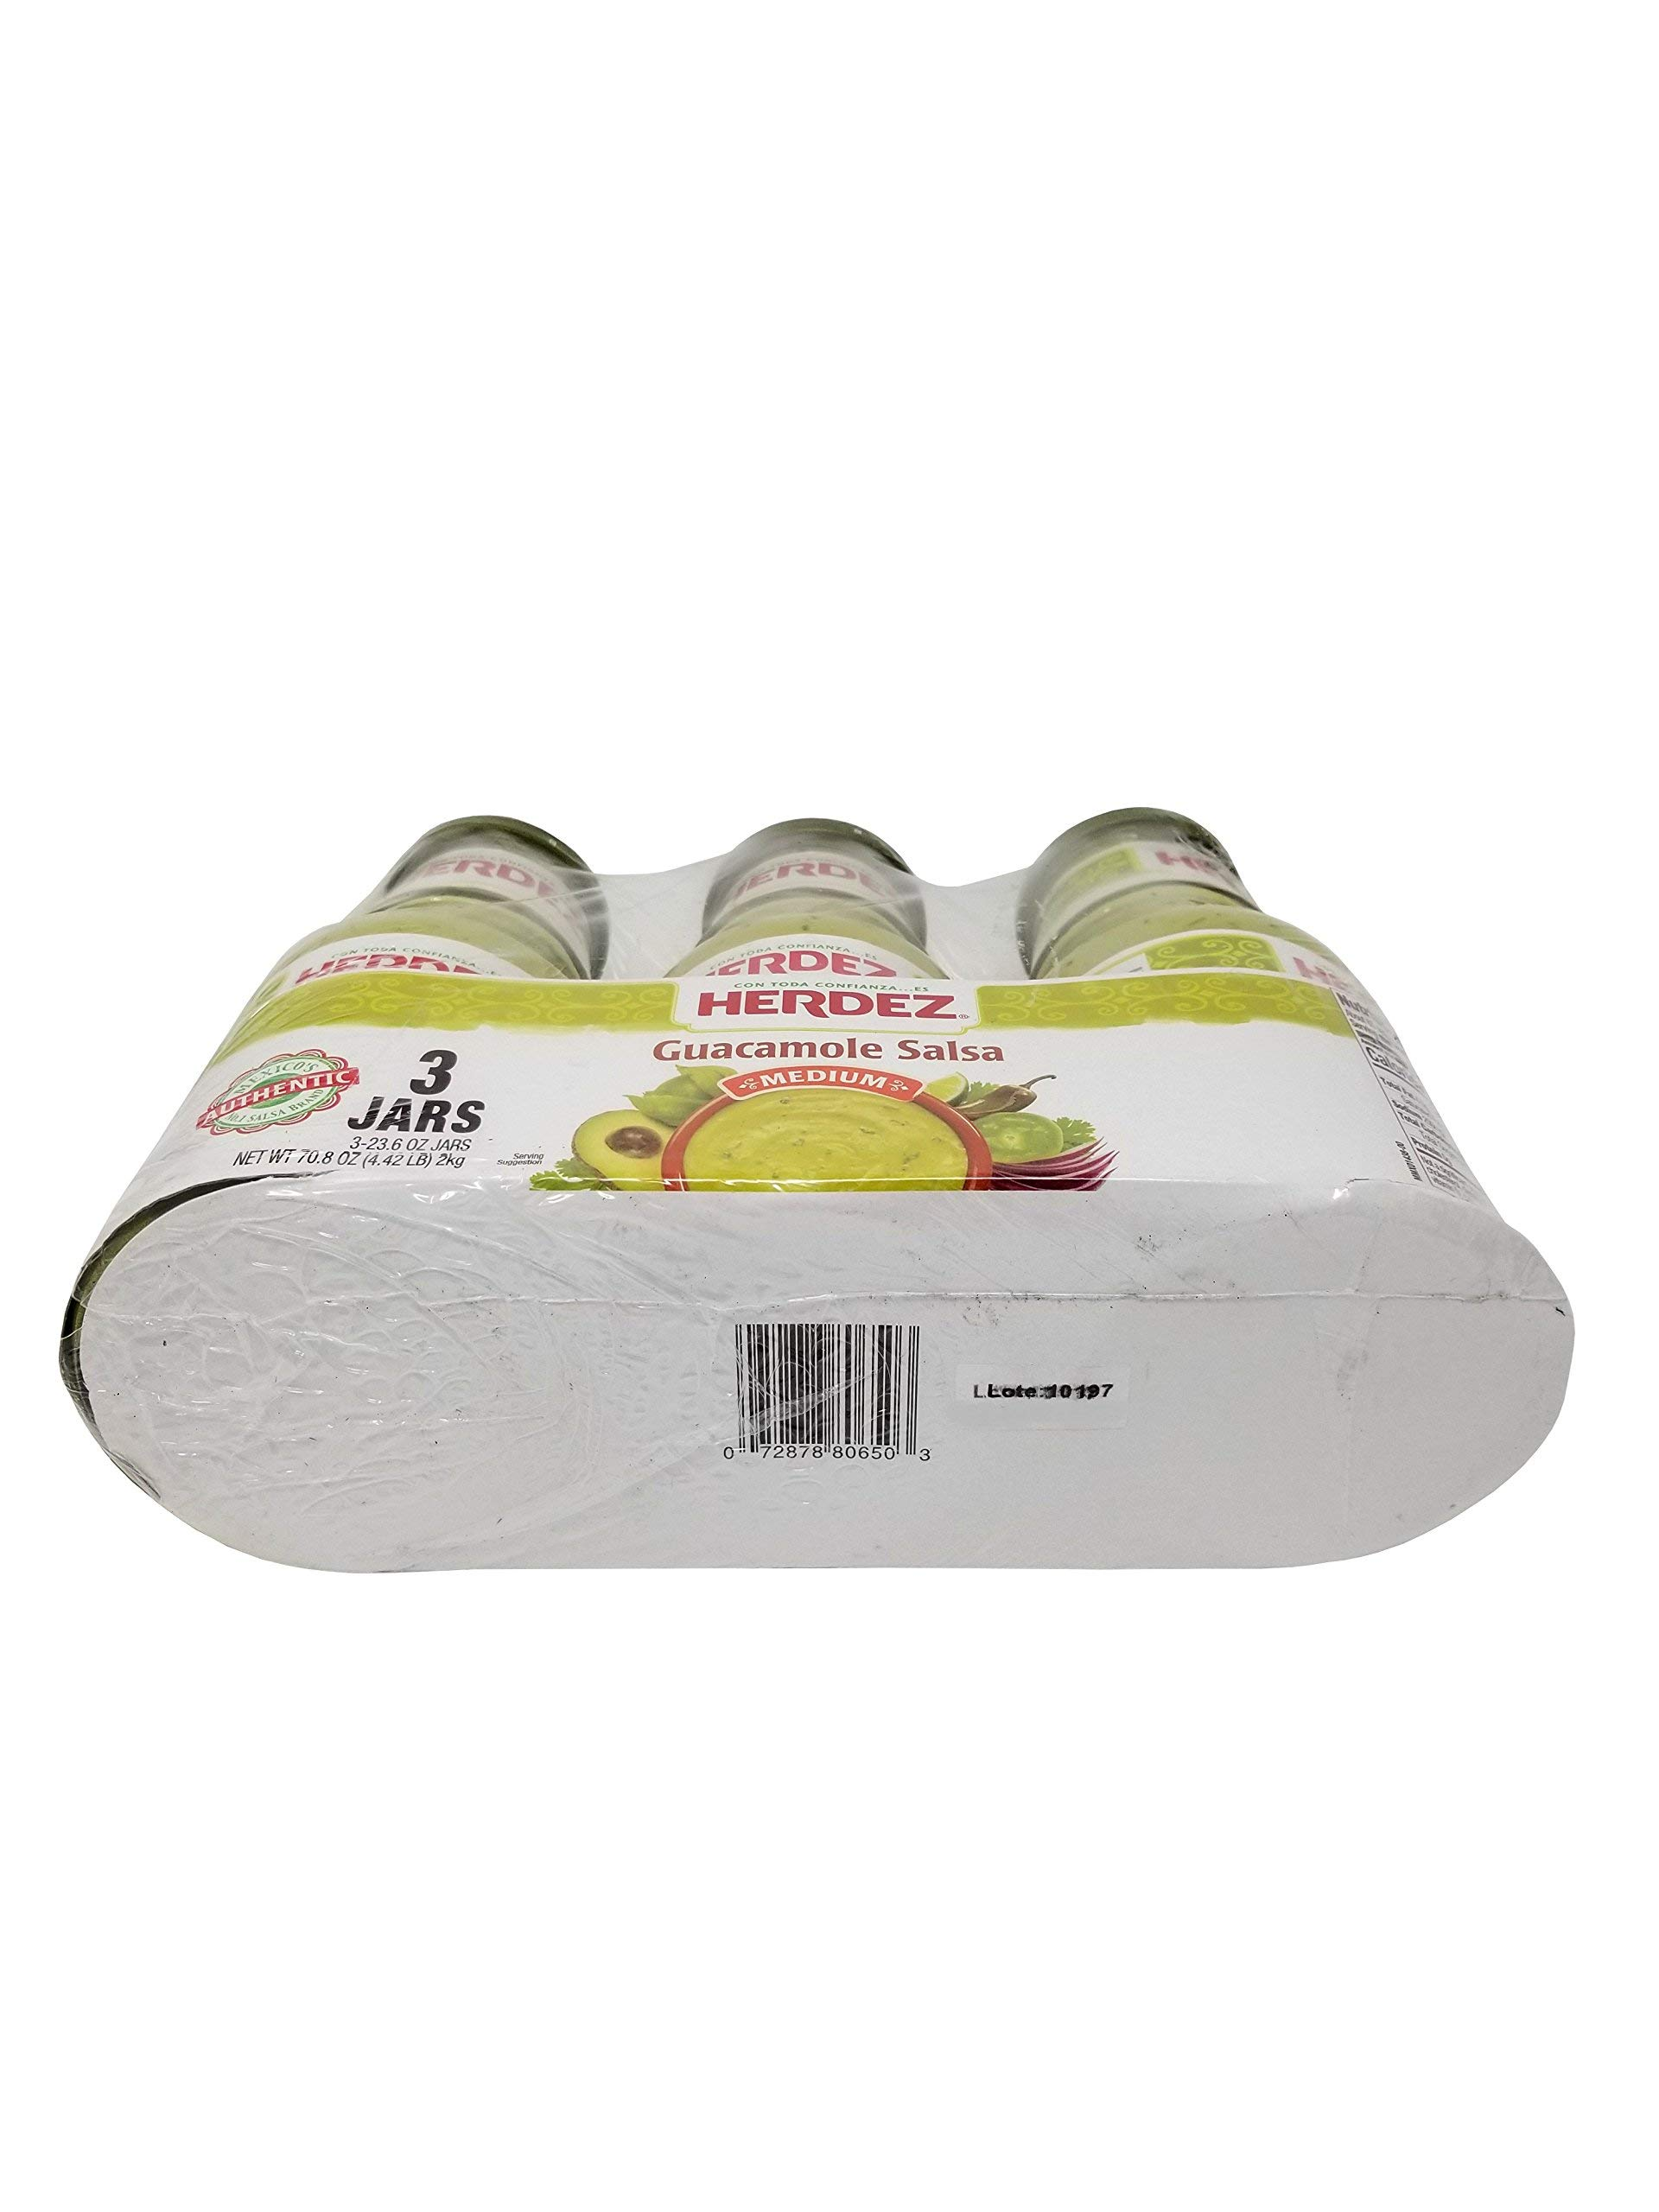 Herdez Guacamole Salsa - Medium - 3 Jars Net 4.42 LB by Herdez